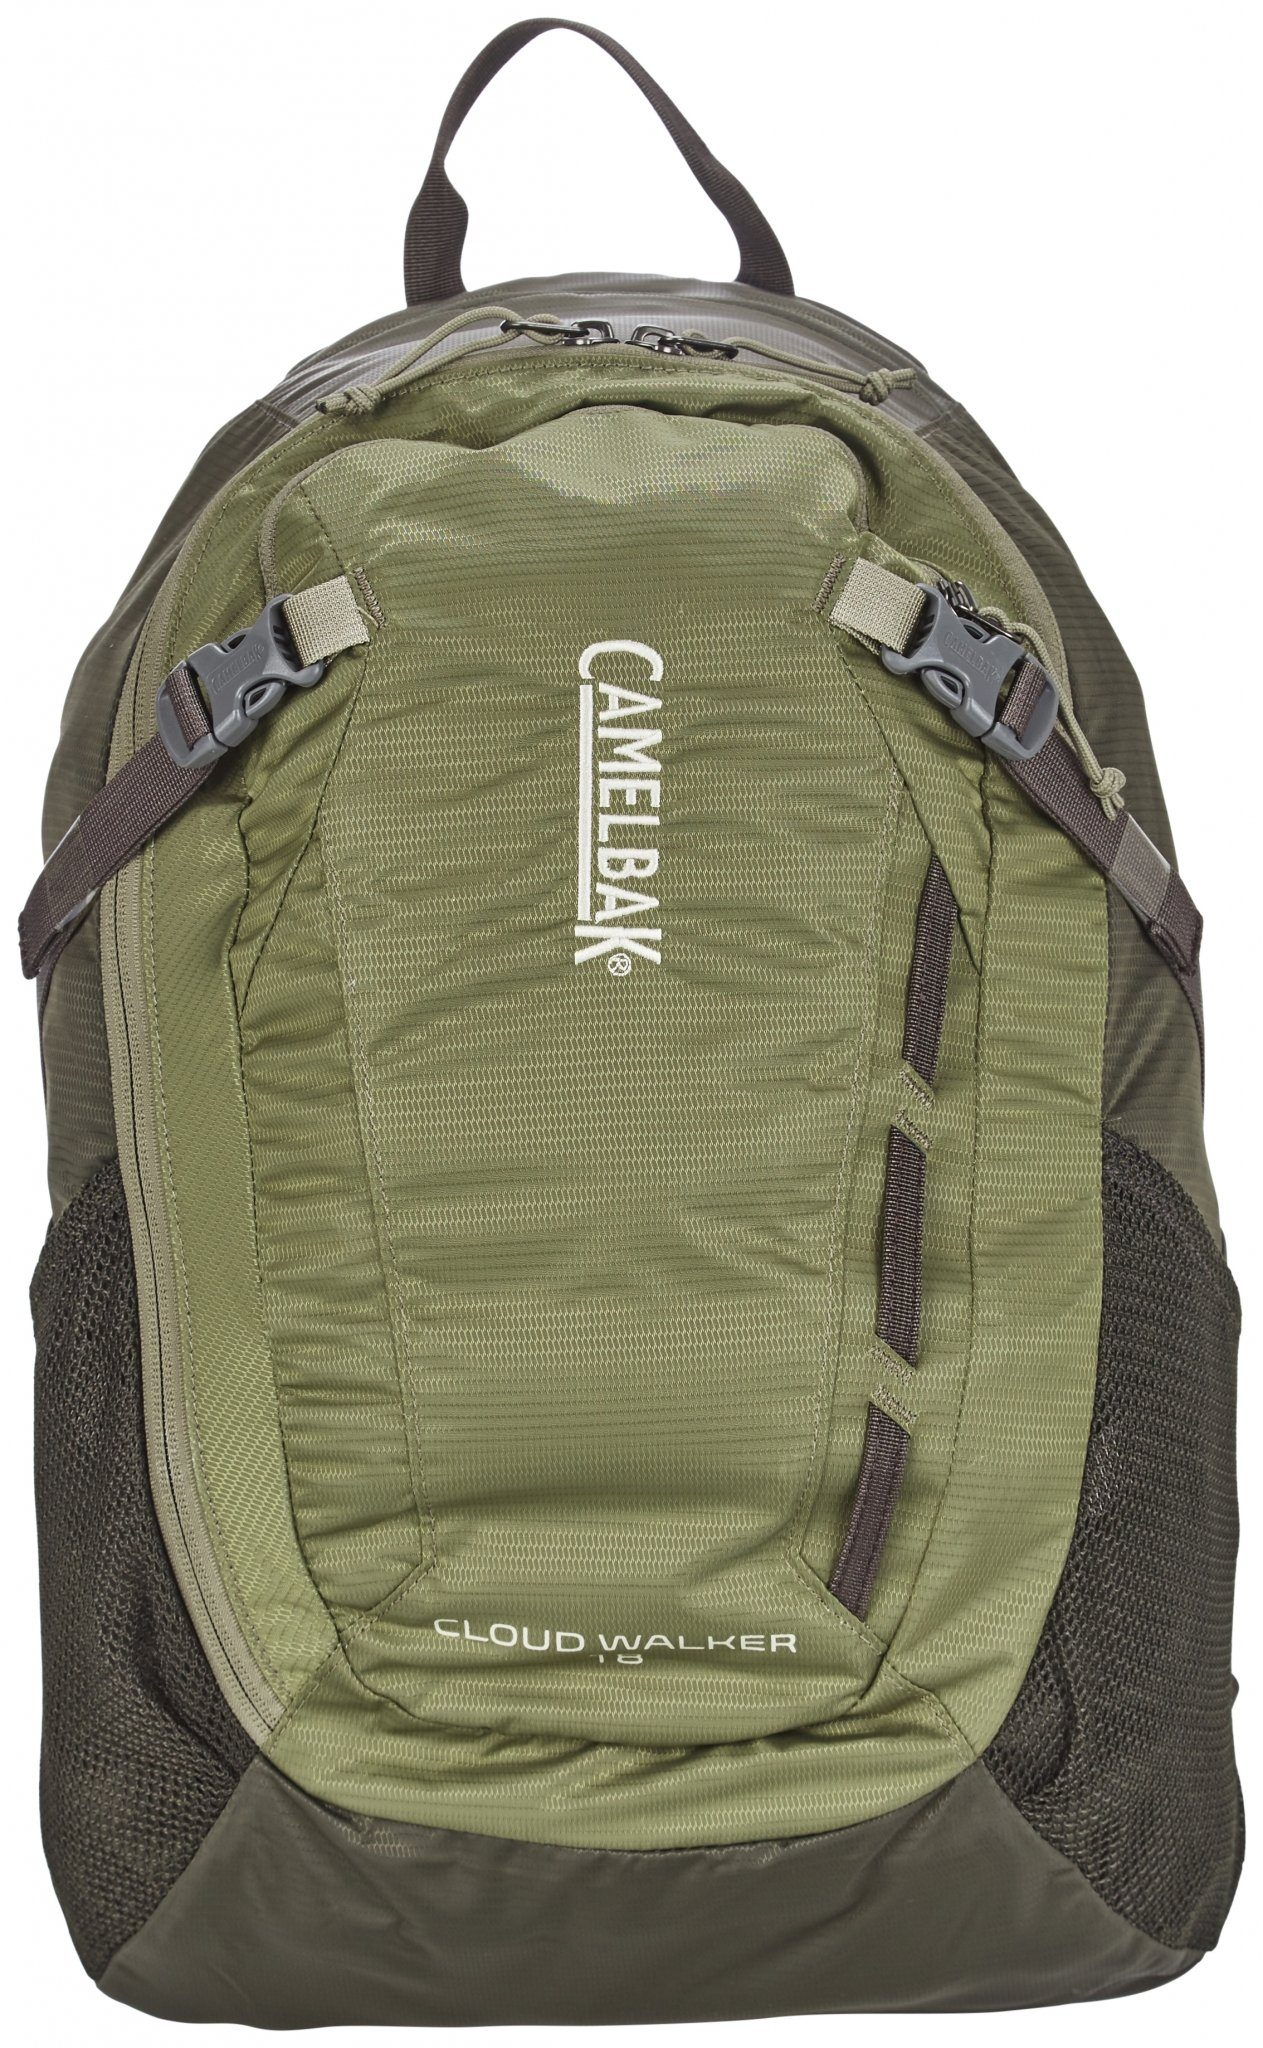 Camelbak Rucksack »Cloud Walker 18 Trinkrucksack«